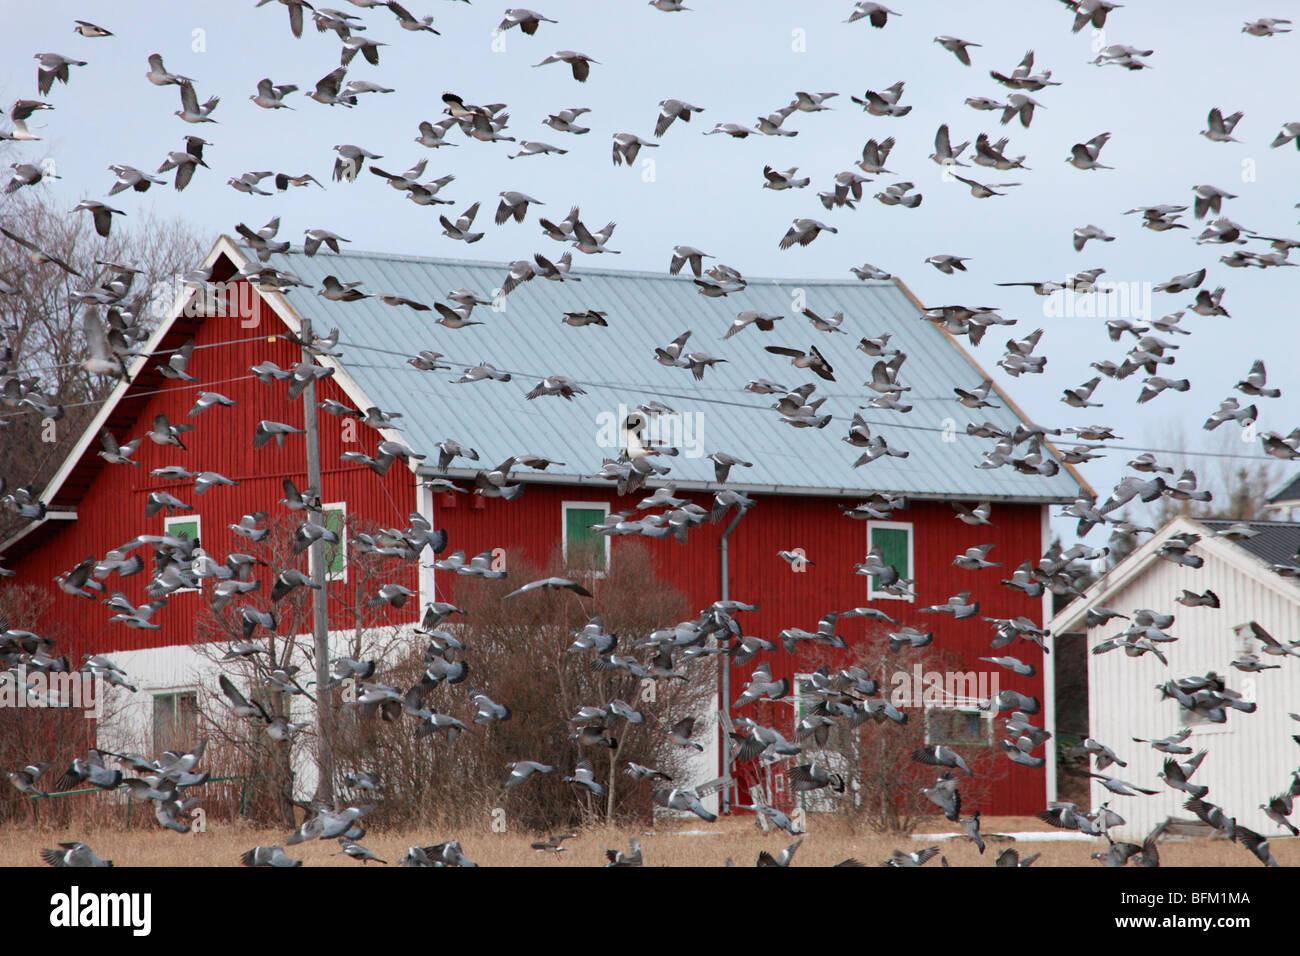 Large flocks of migratory Wood pigeons (Columba palumbus)  return to their breeding areas in northern Sweden. - Stock Image